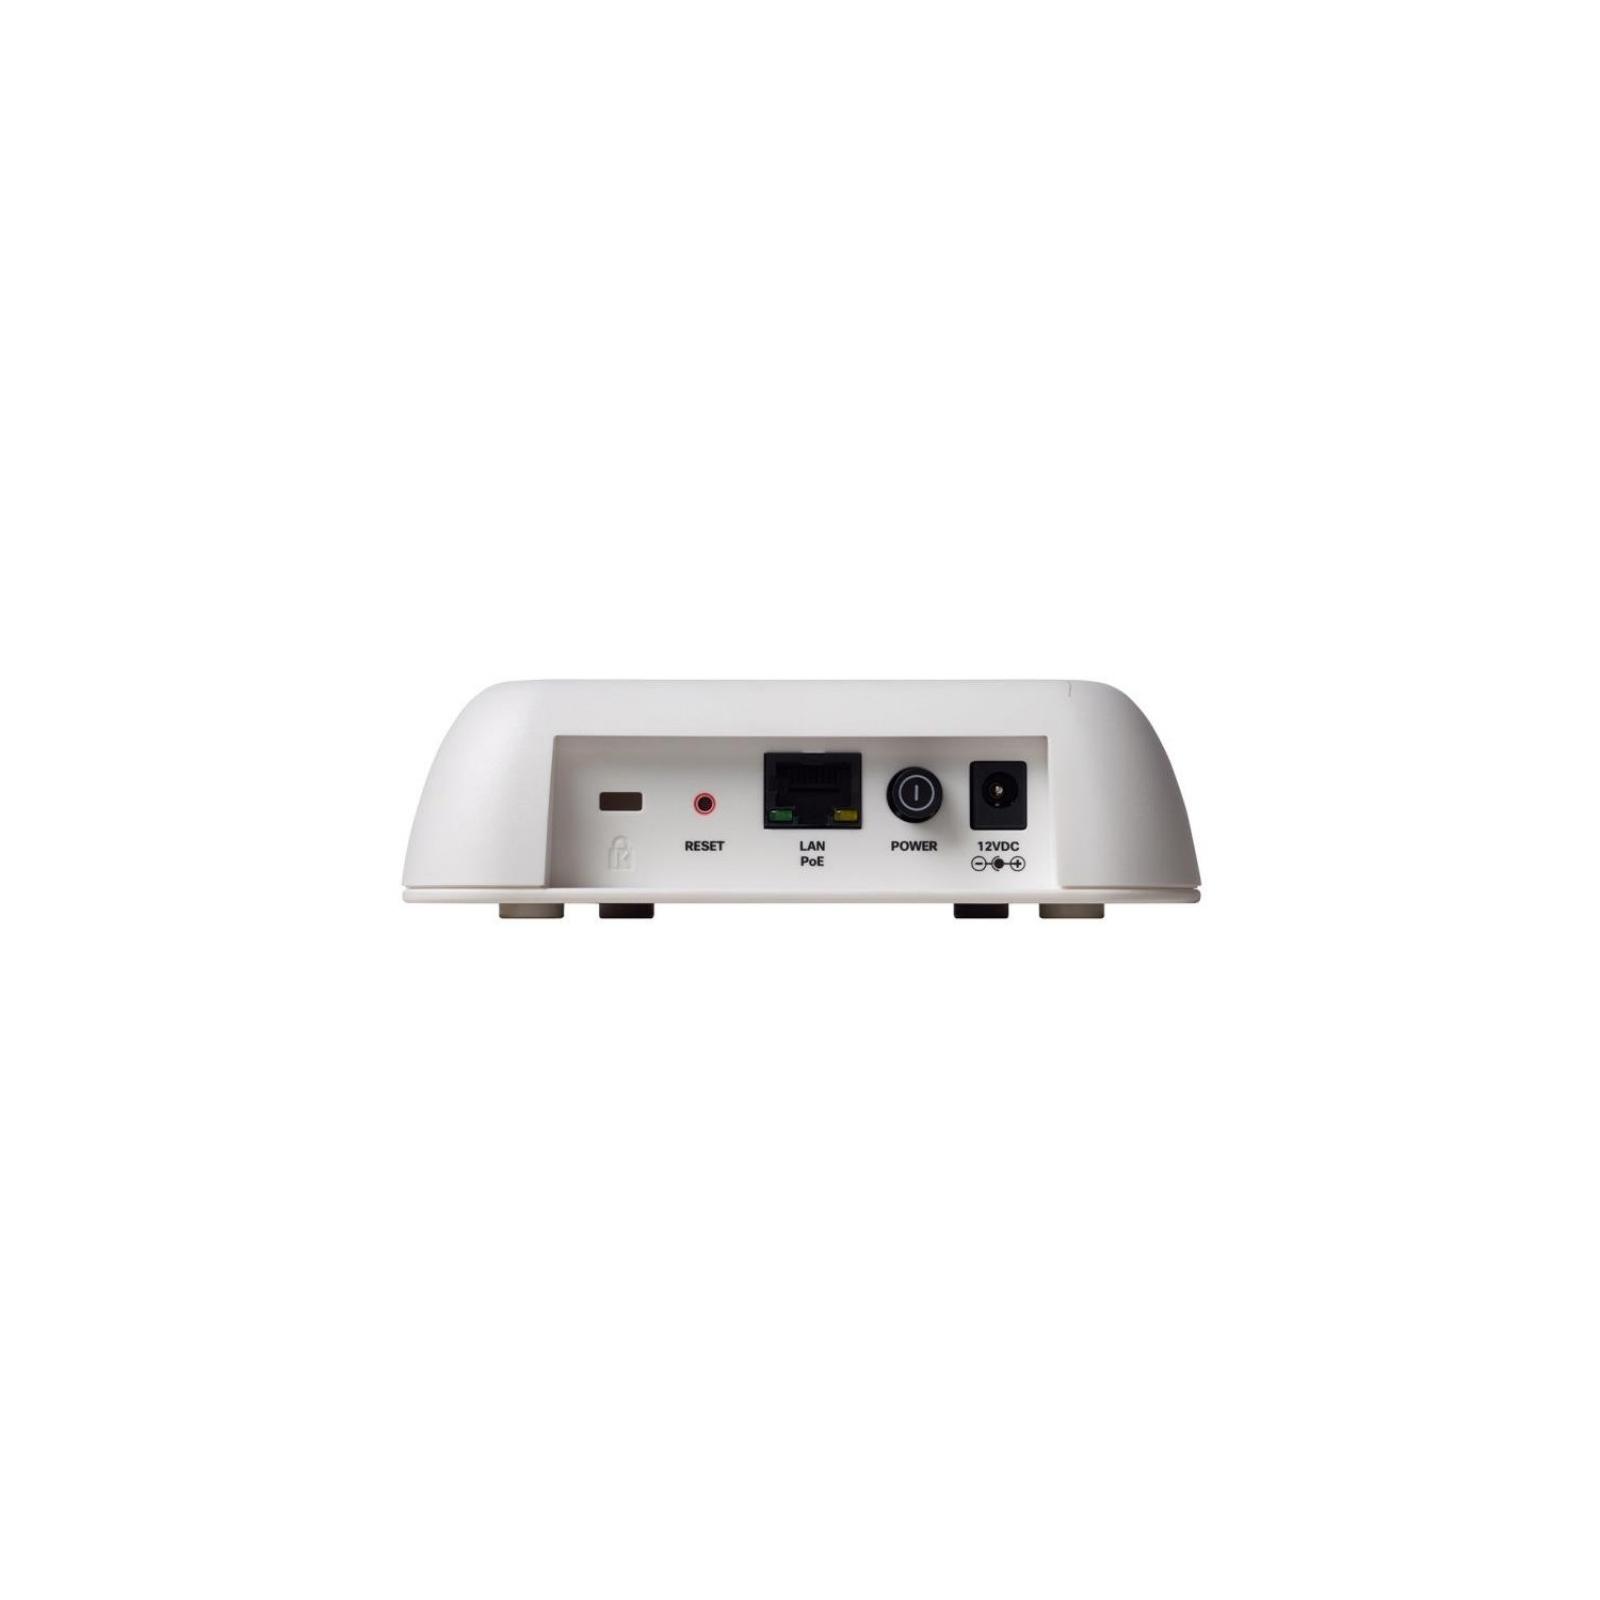 Точка доступа Wi-Fi Cisco WAP150-E-K9 изображение 2